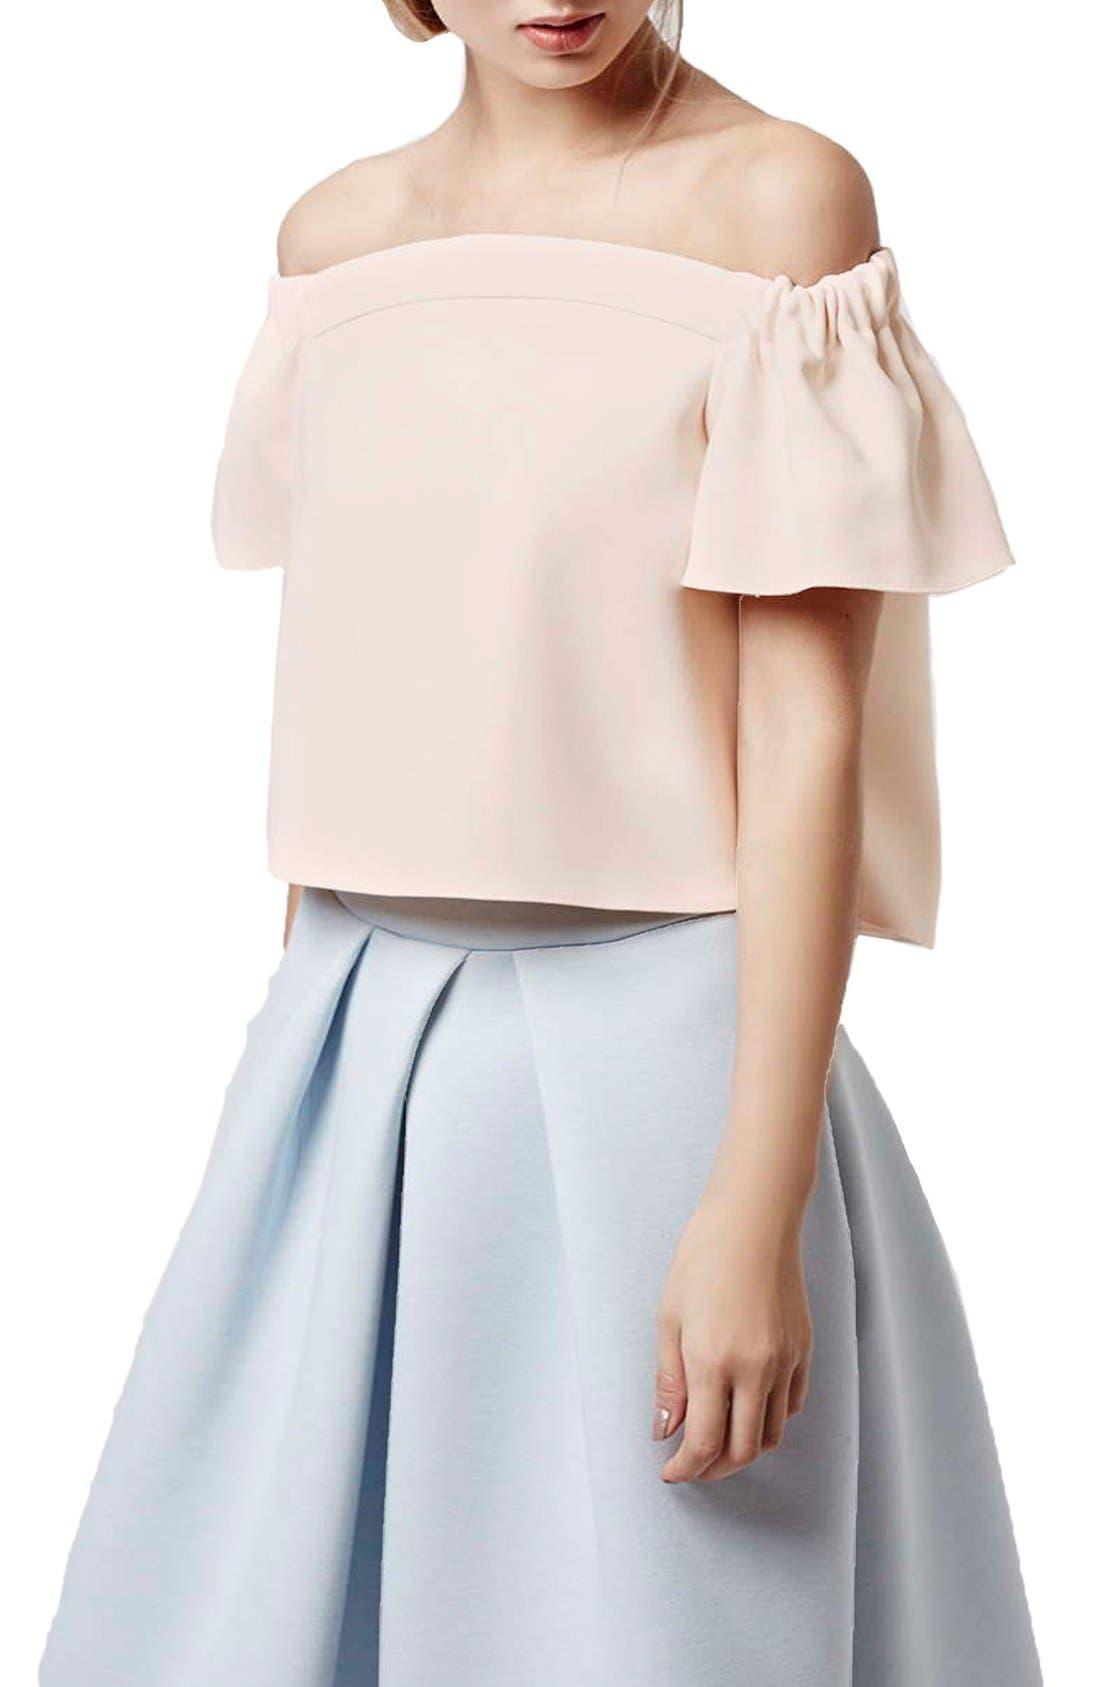 Alternate Image 1 Selected - Topshop Structured Bardot Top (Petite)